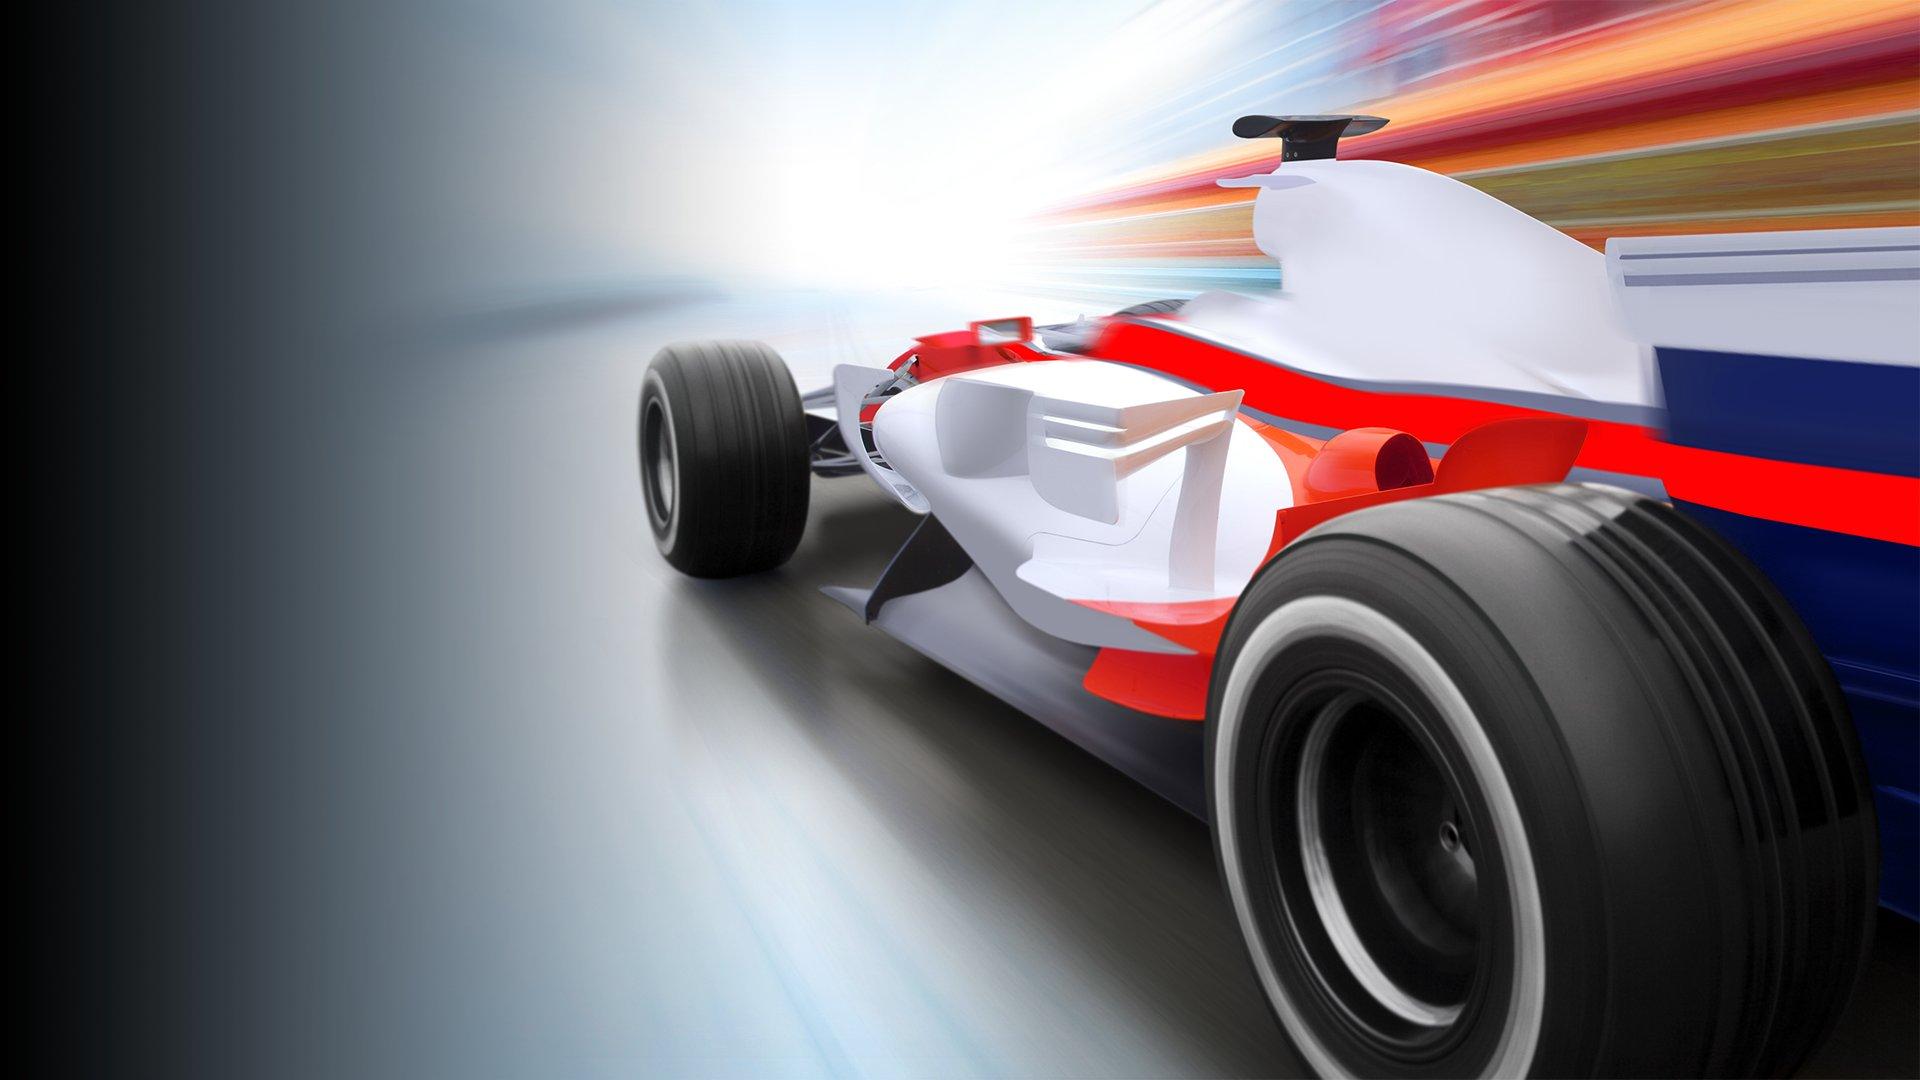 fond F1 - Grand Prix d'Azerbaïdjan : Revoir l'accident de Verstappen et Ricciardo